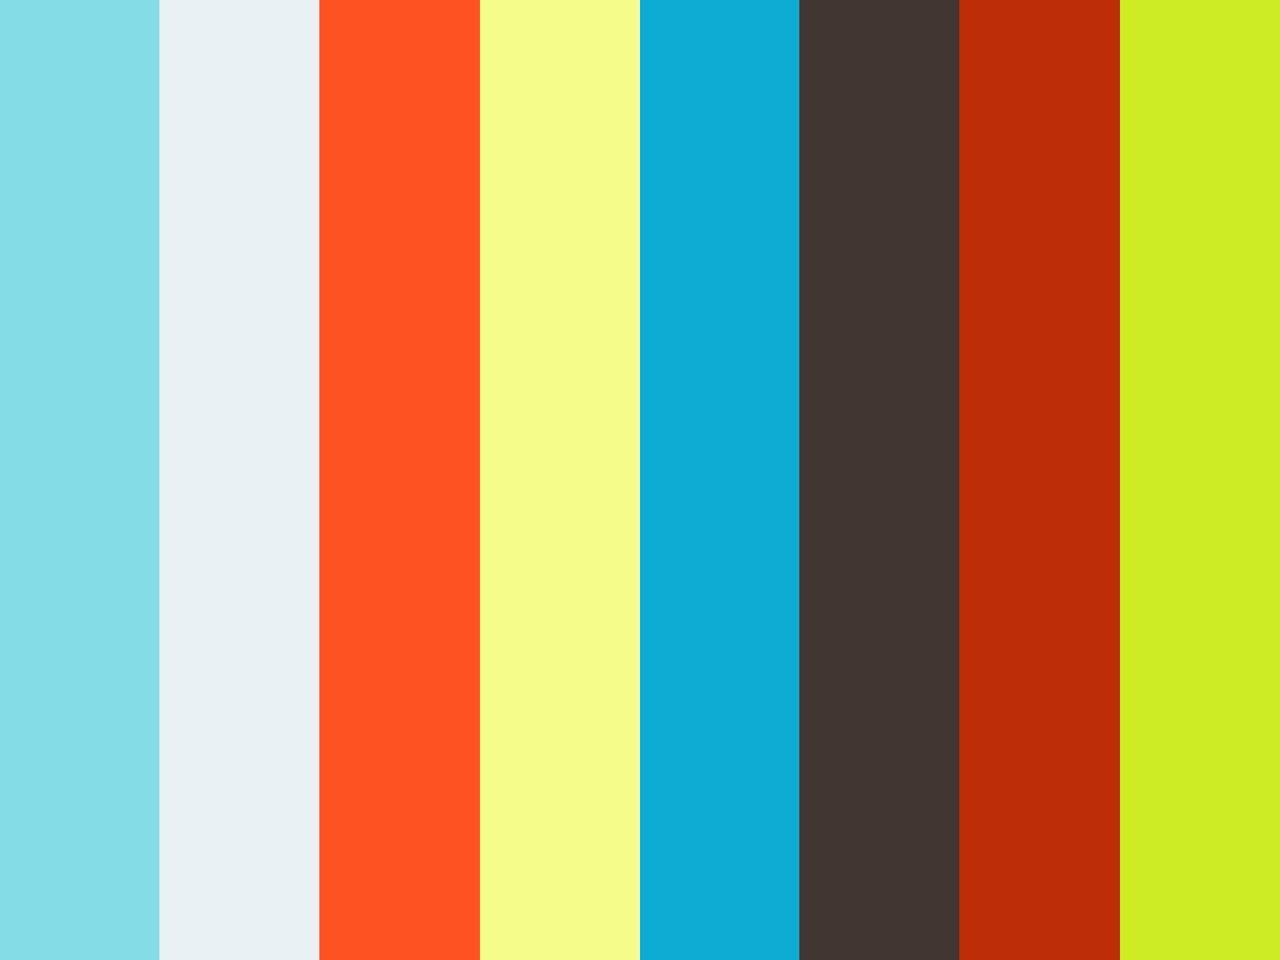 Wix.com Official 2018 Big Game Ad with Rhett & Link [720p]